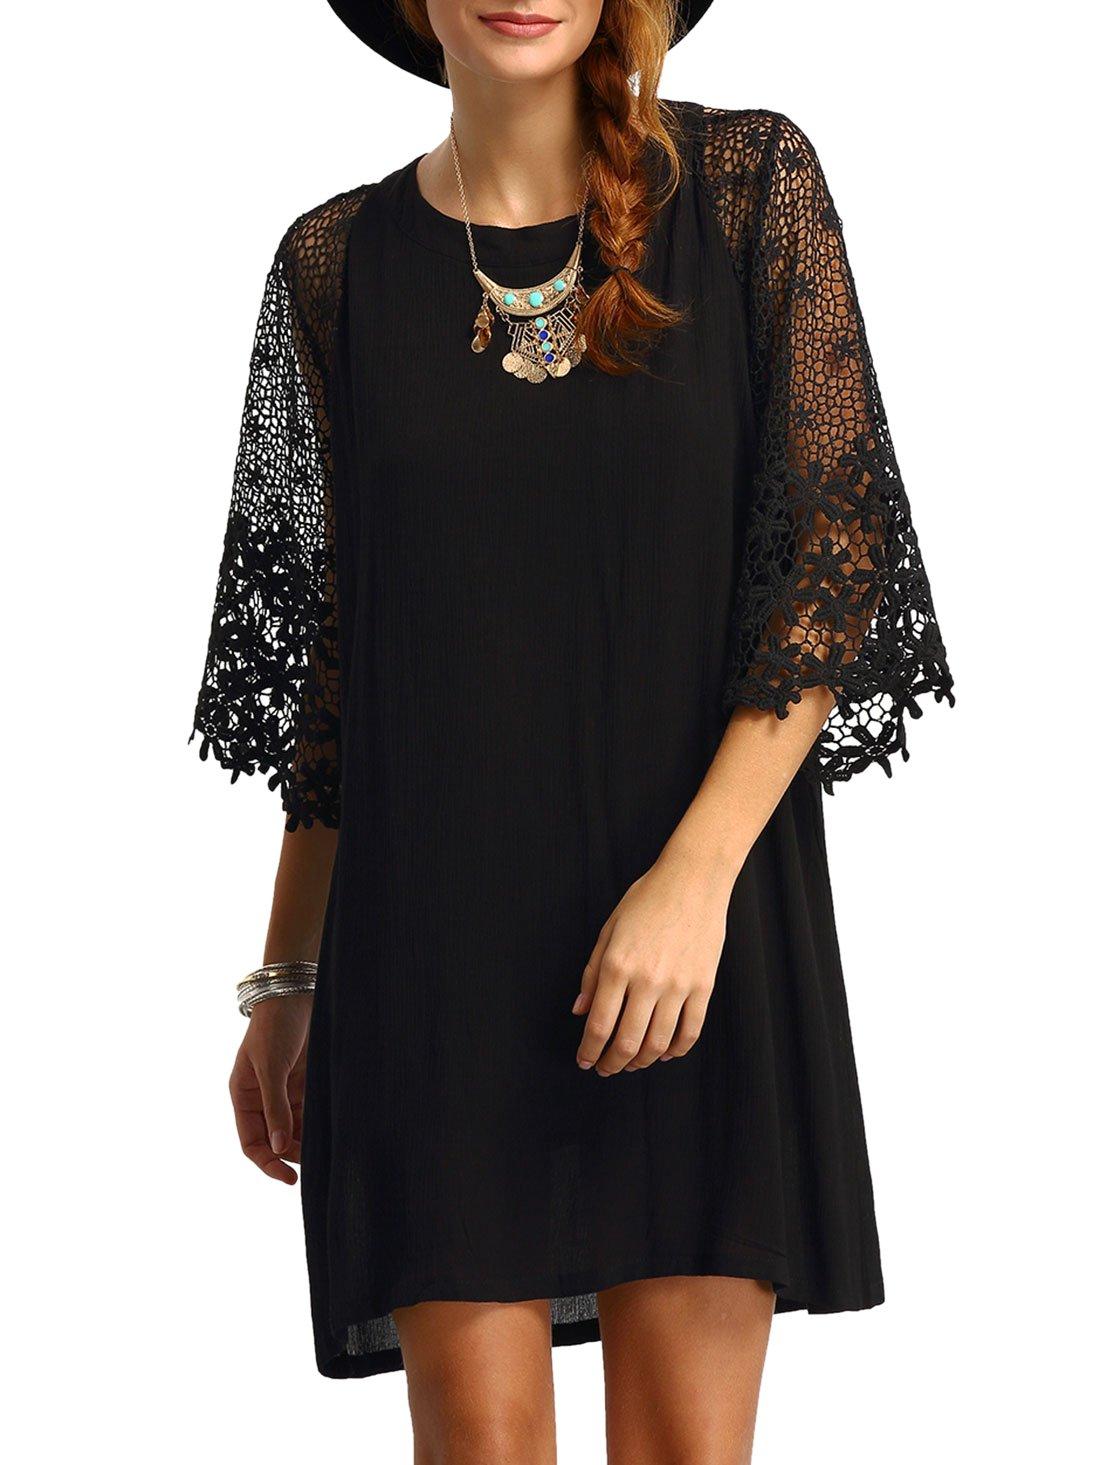 MakeMeChic Women's Casual Crewneck Half Sleeve Summer Chiffon Tunic Dress Black M